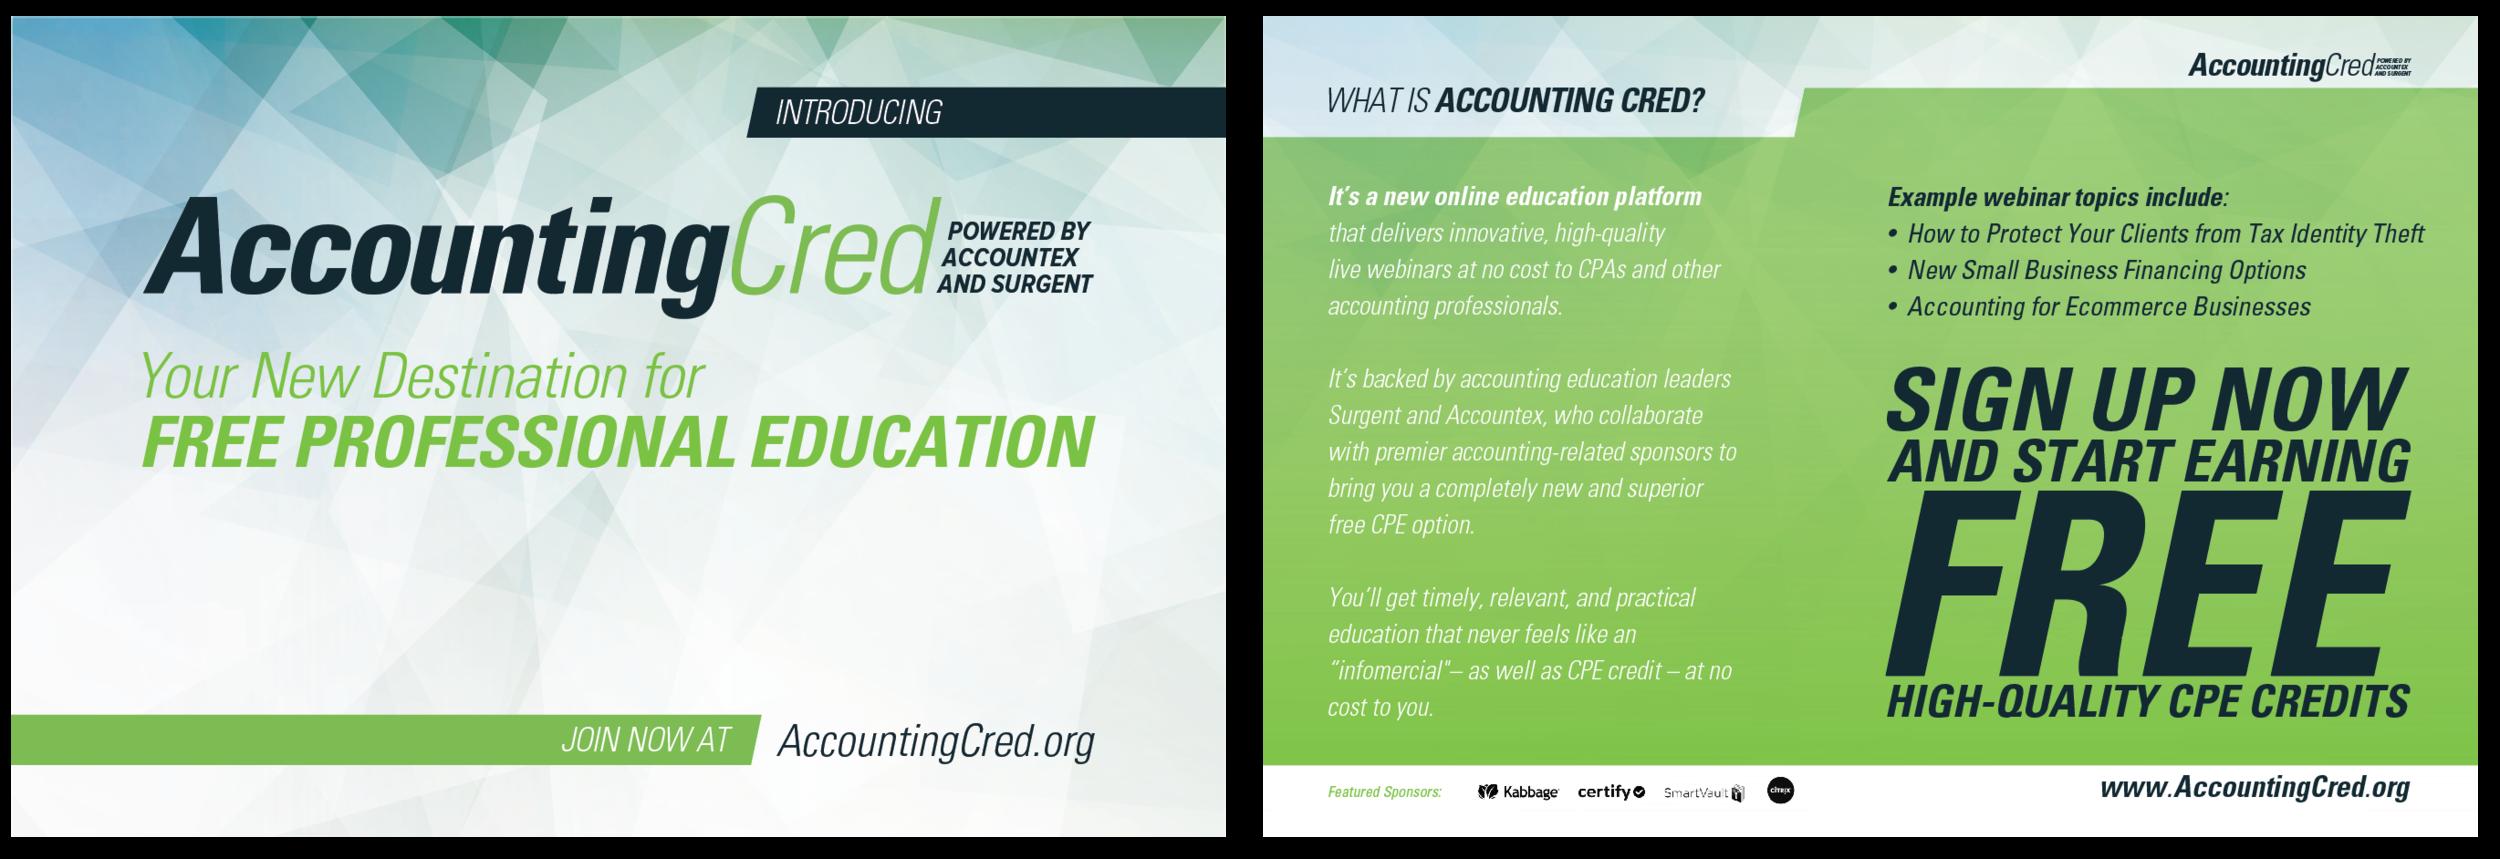 AccountingCred's postcard design.